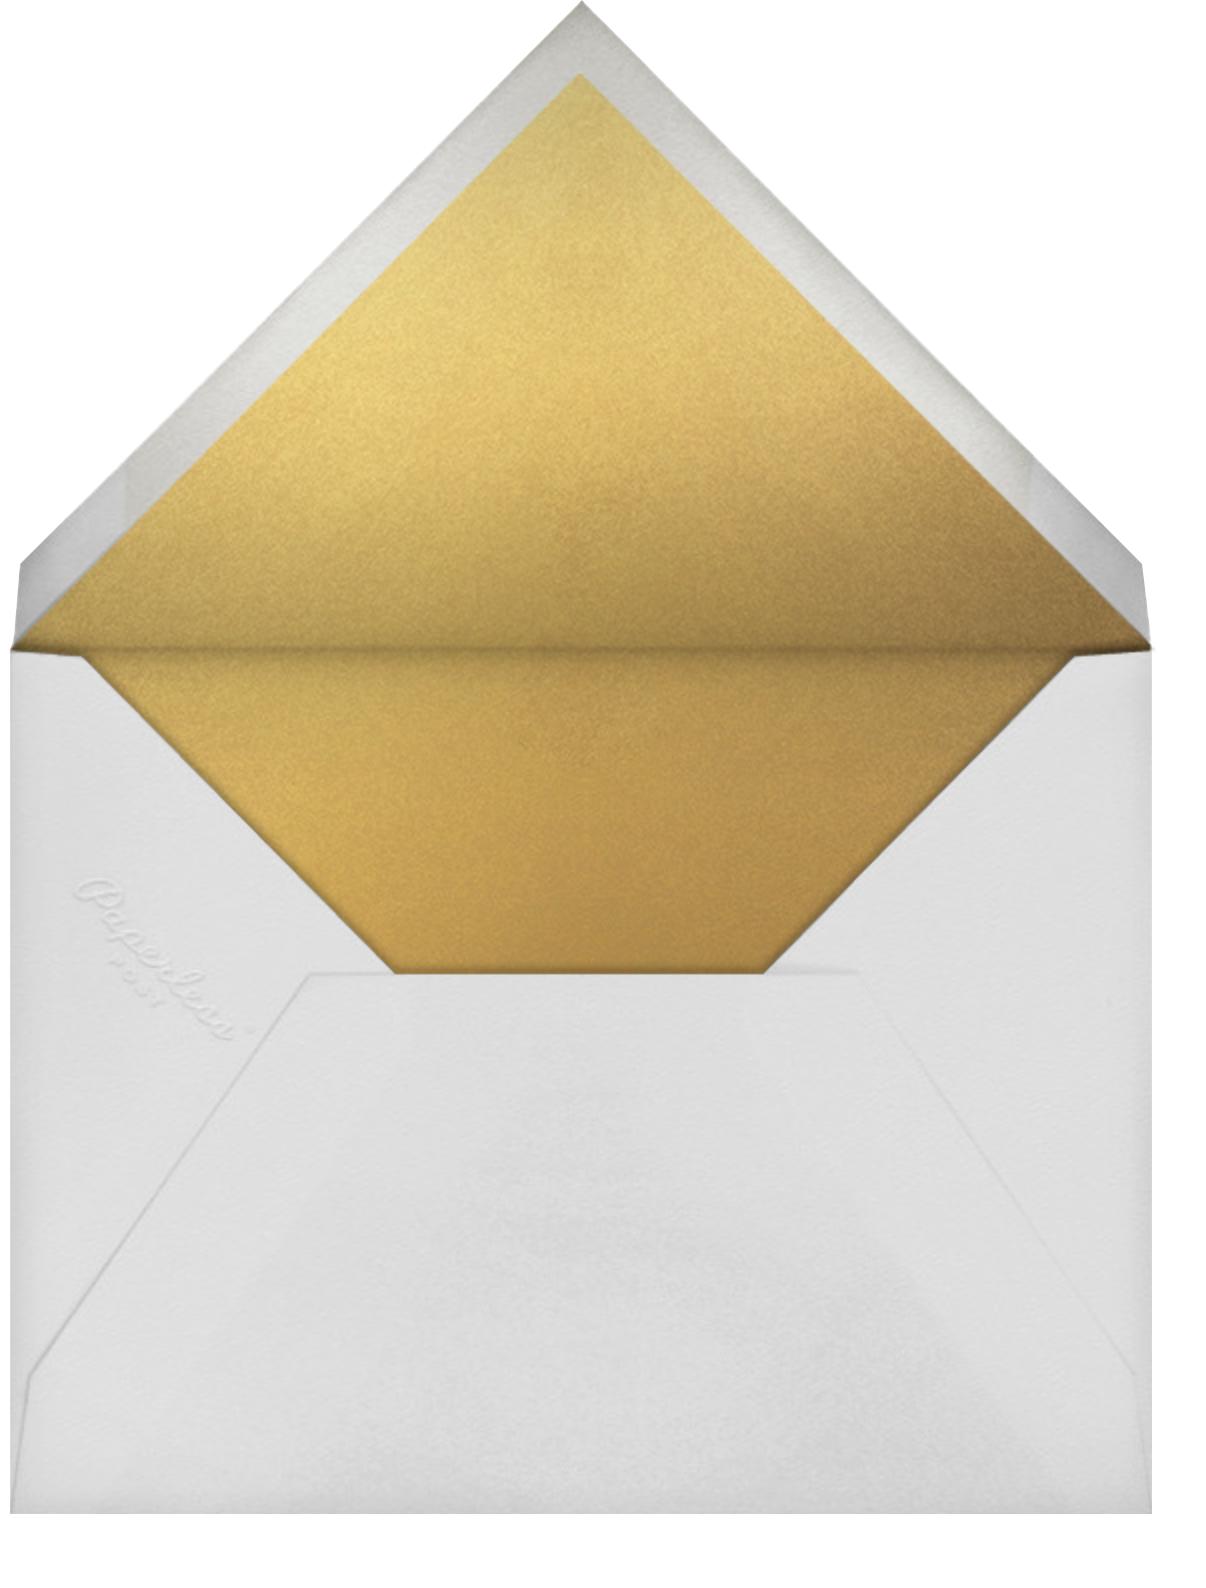 Firth - Amethyst - Vera Wang - Anniversary party - envelope back